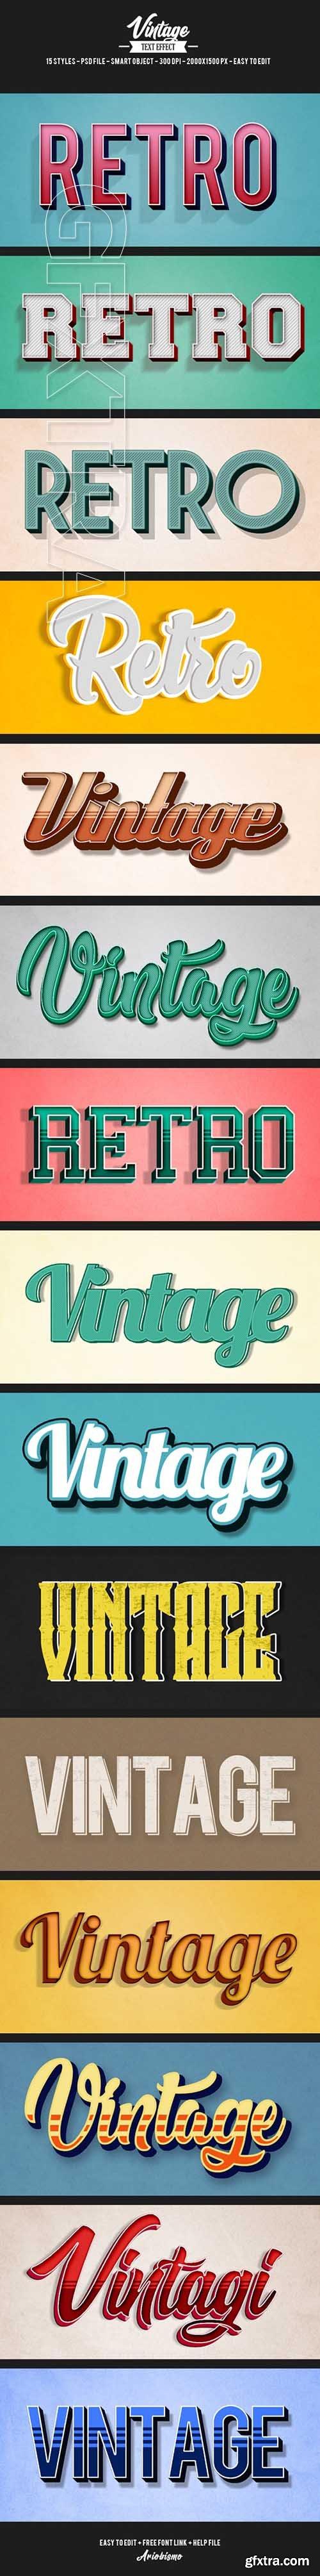 Graphicriver - 15 Retro Vintage Text Effects 21314565